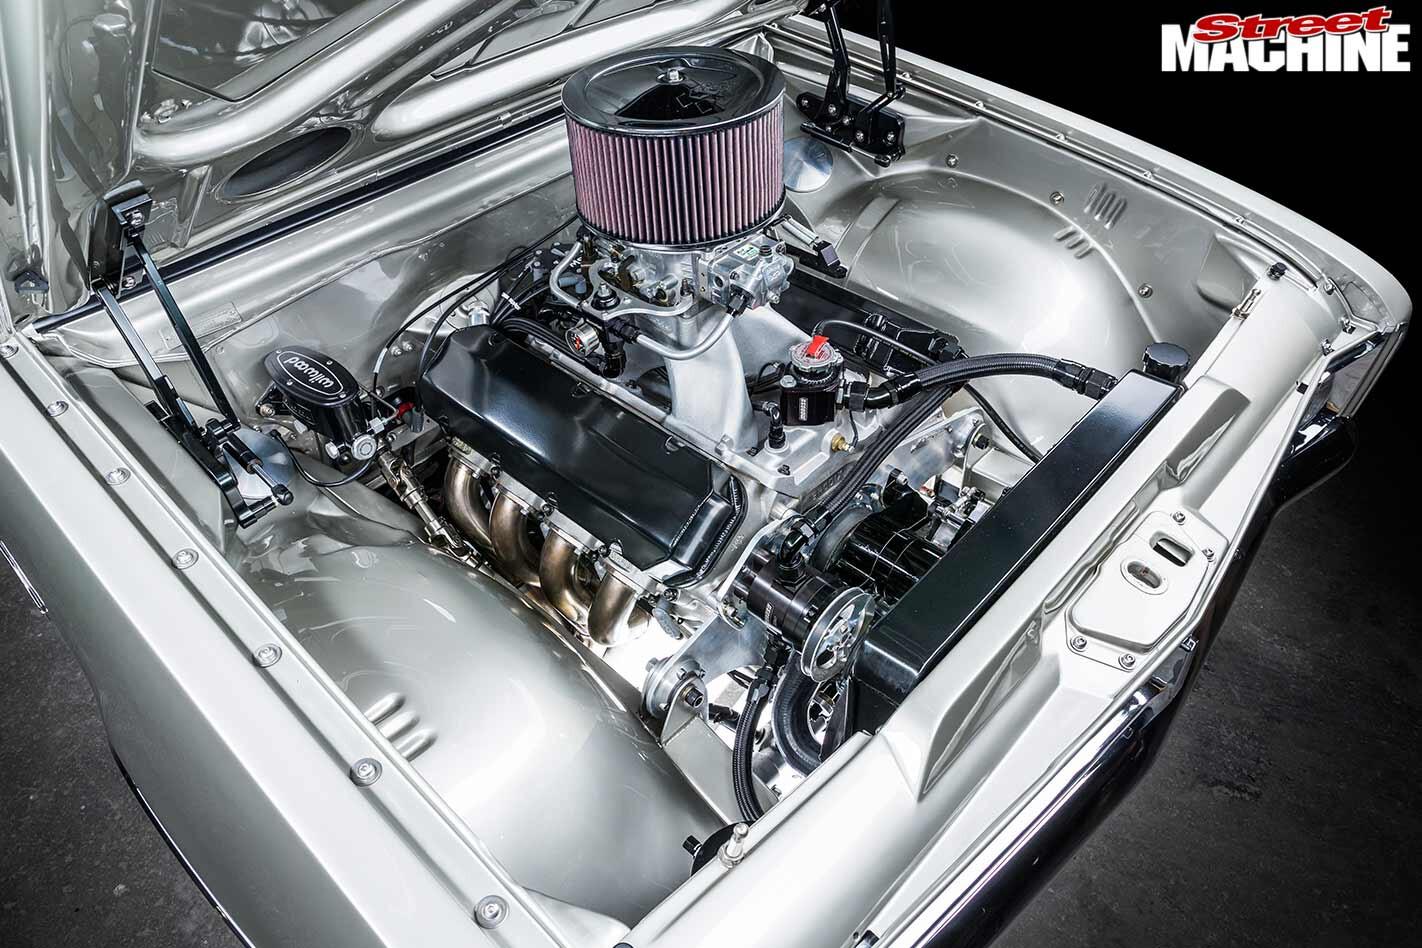 Holden HK Monaro GTS engine bay